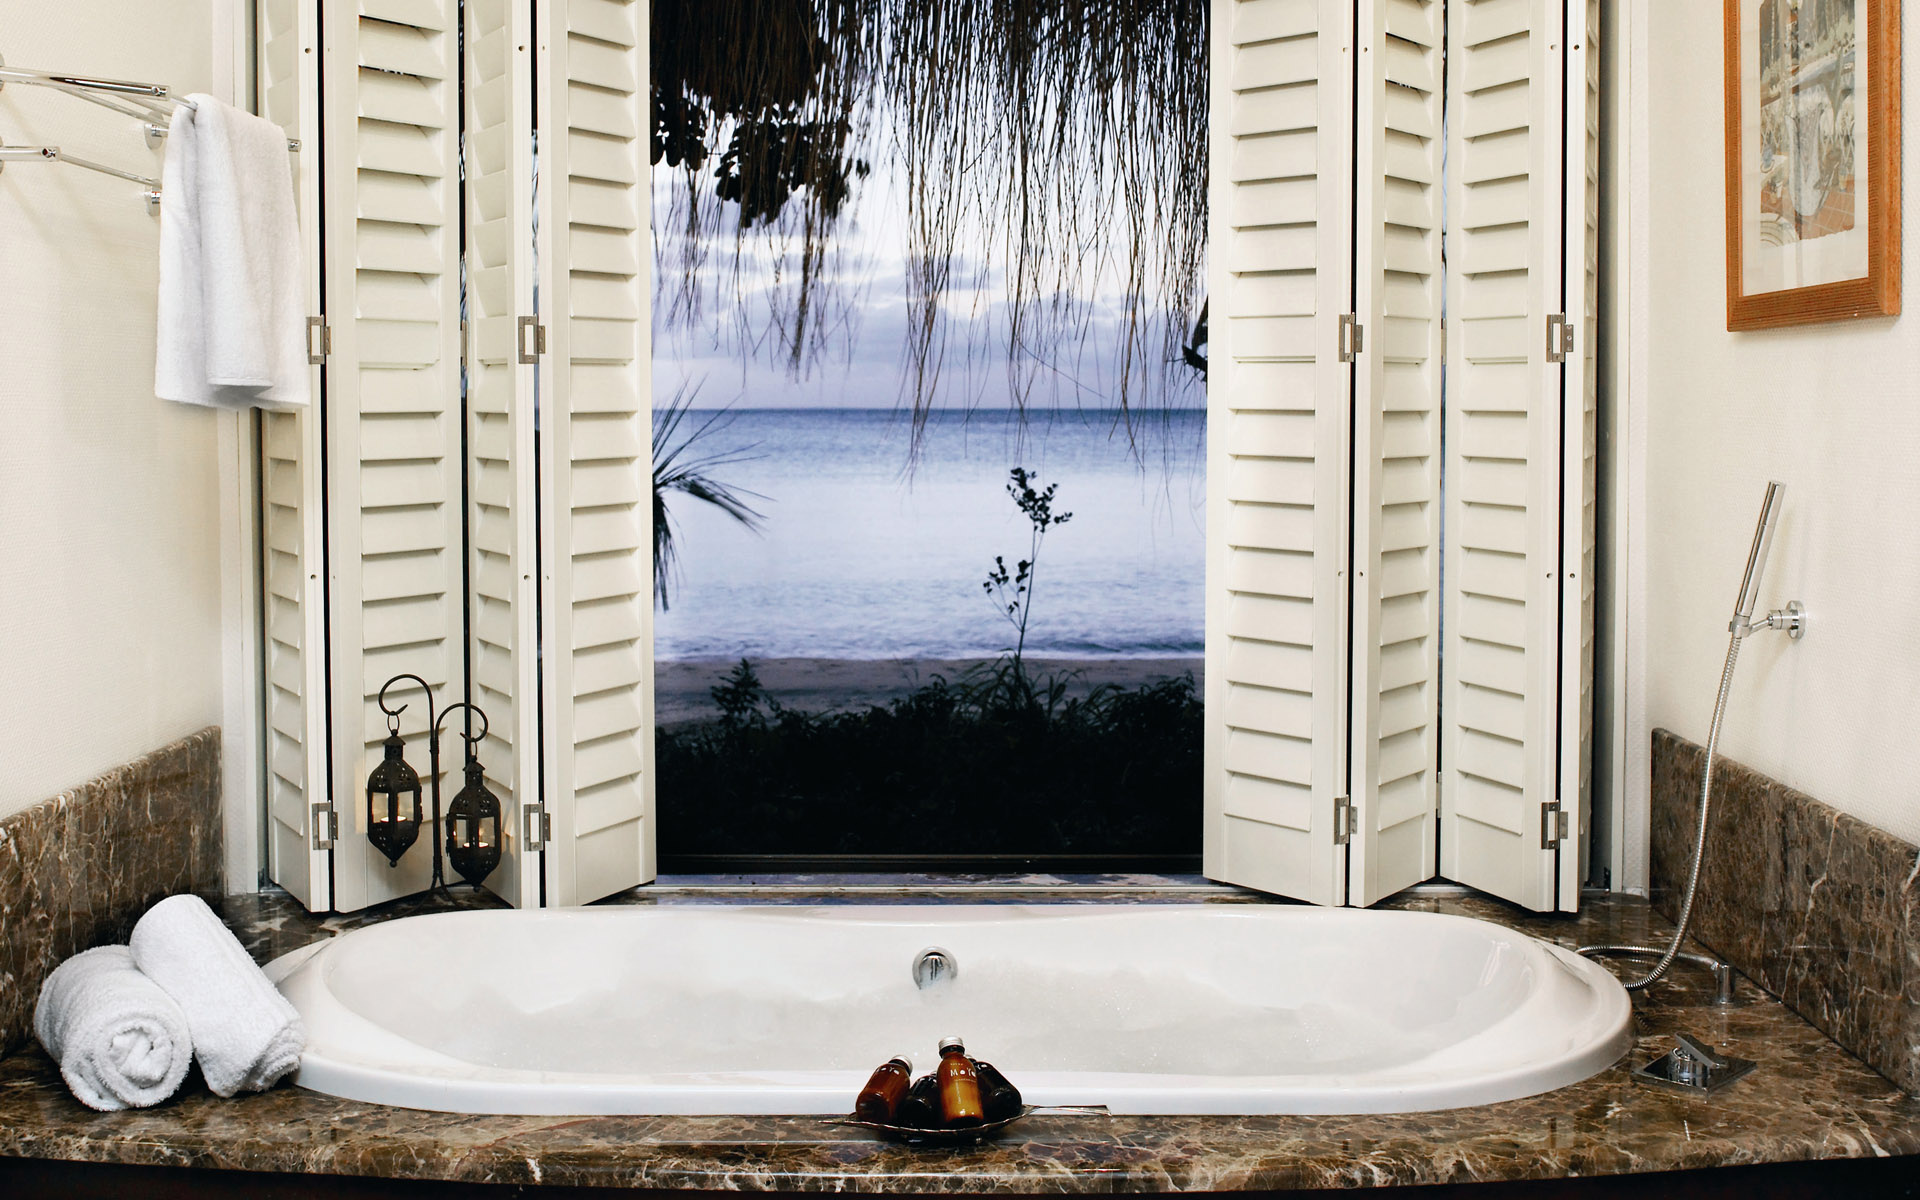 Bathroom_bathtub-and-open-window Bathroom bathtub and open window